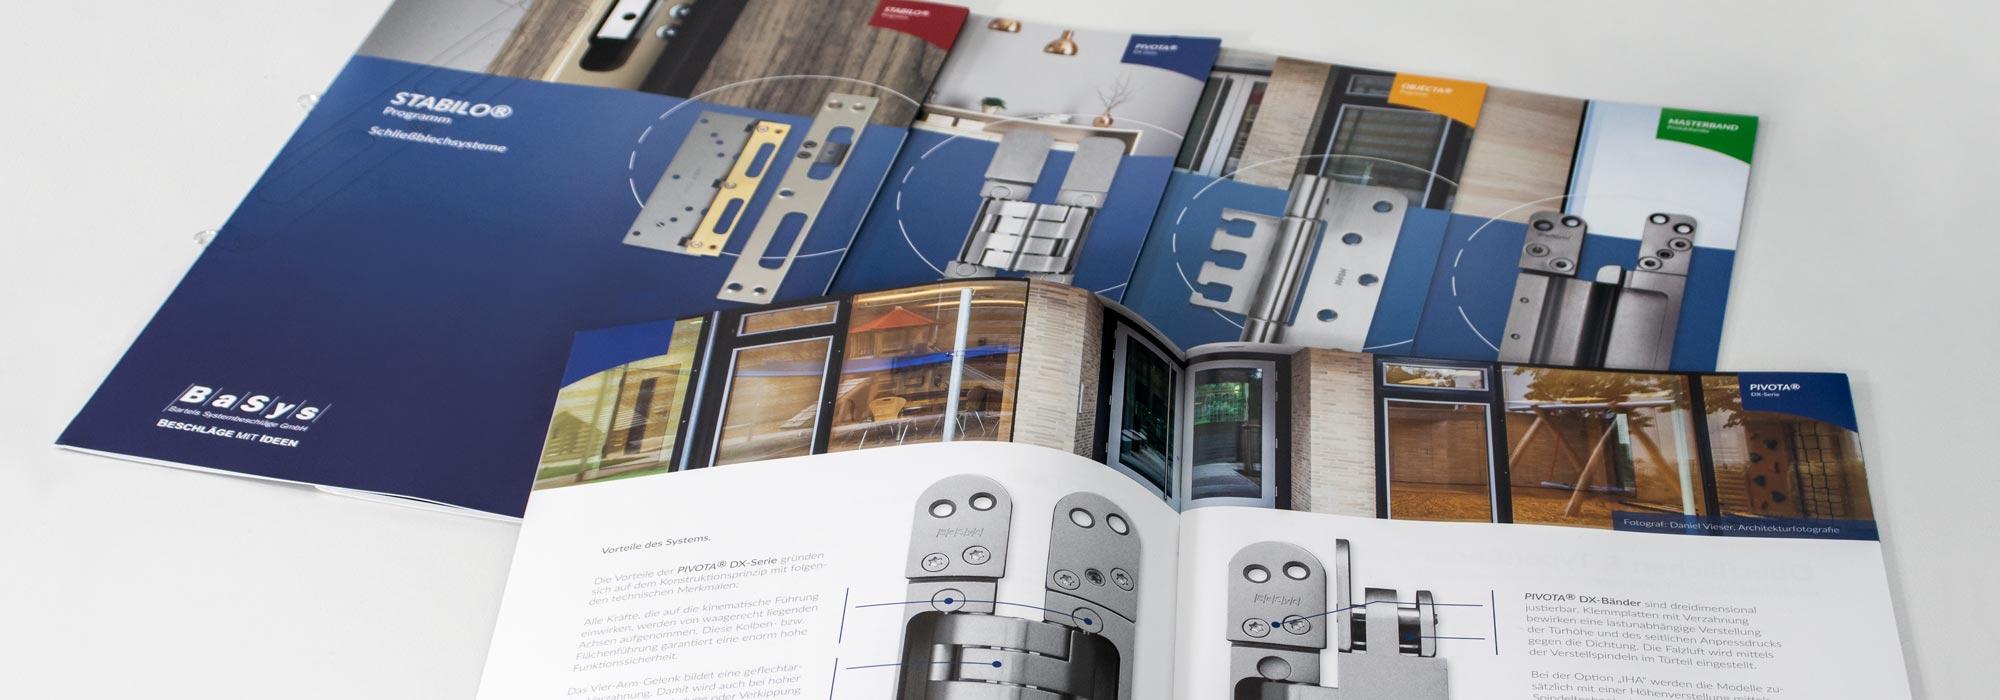 Corporate Design | Werbeagentur Siekmann